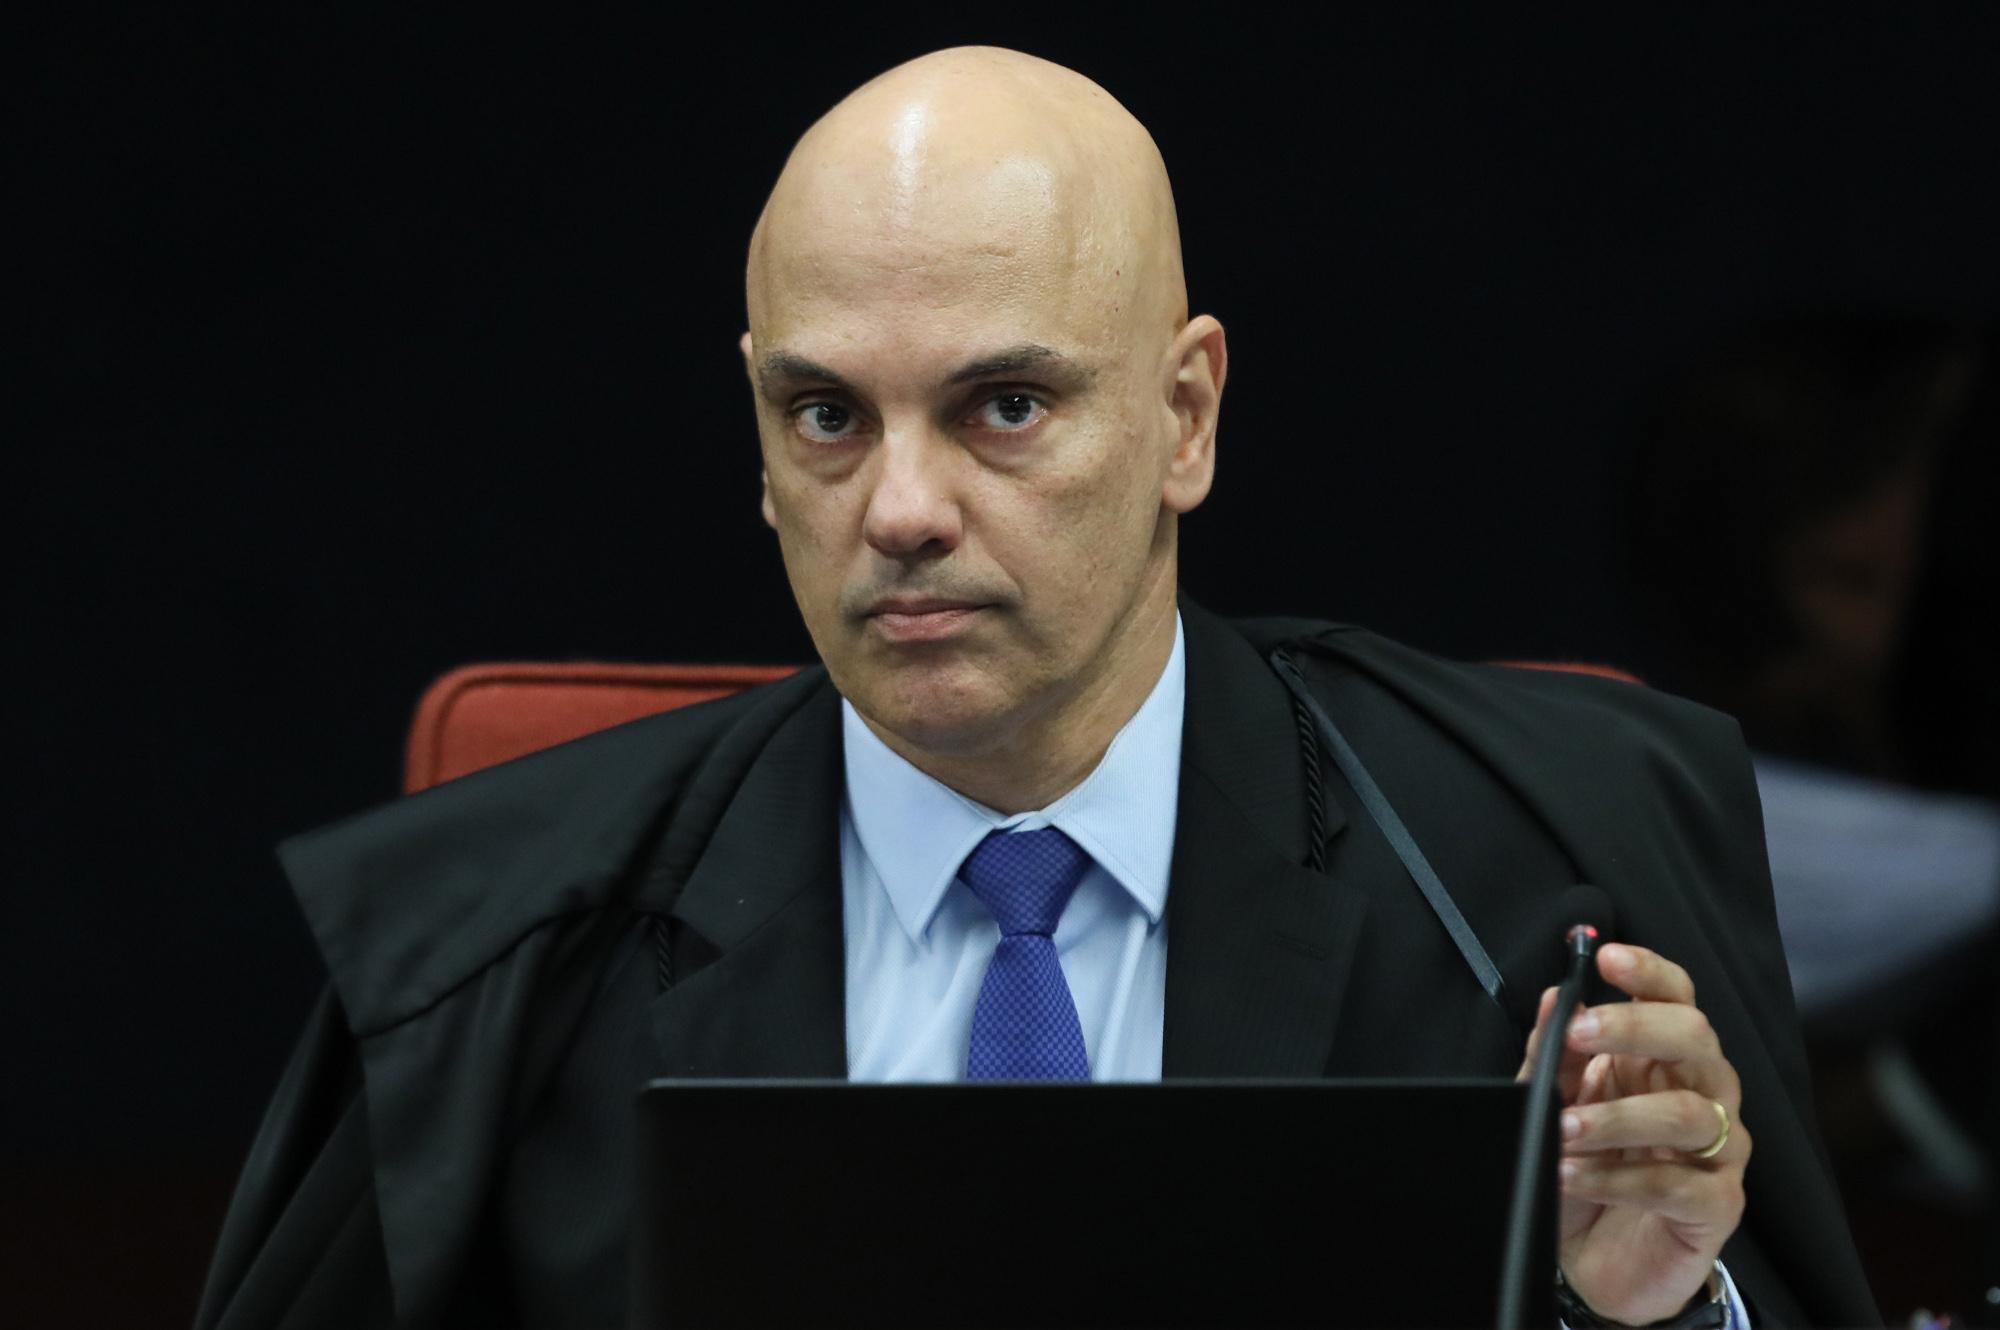 IMAGEM: Moraes recebe desagravo do TSE após Bolsonaro pedir seu impeachment